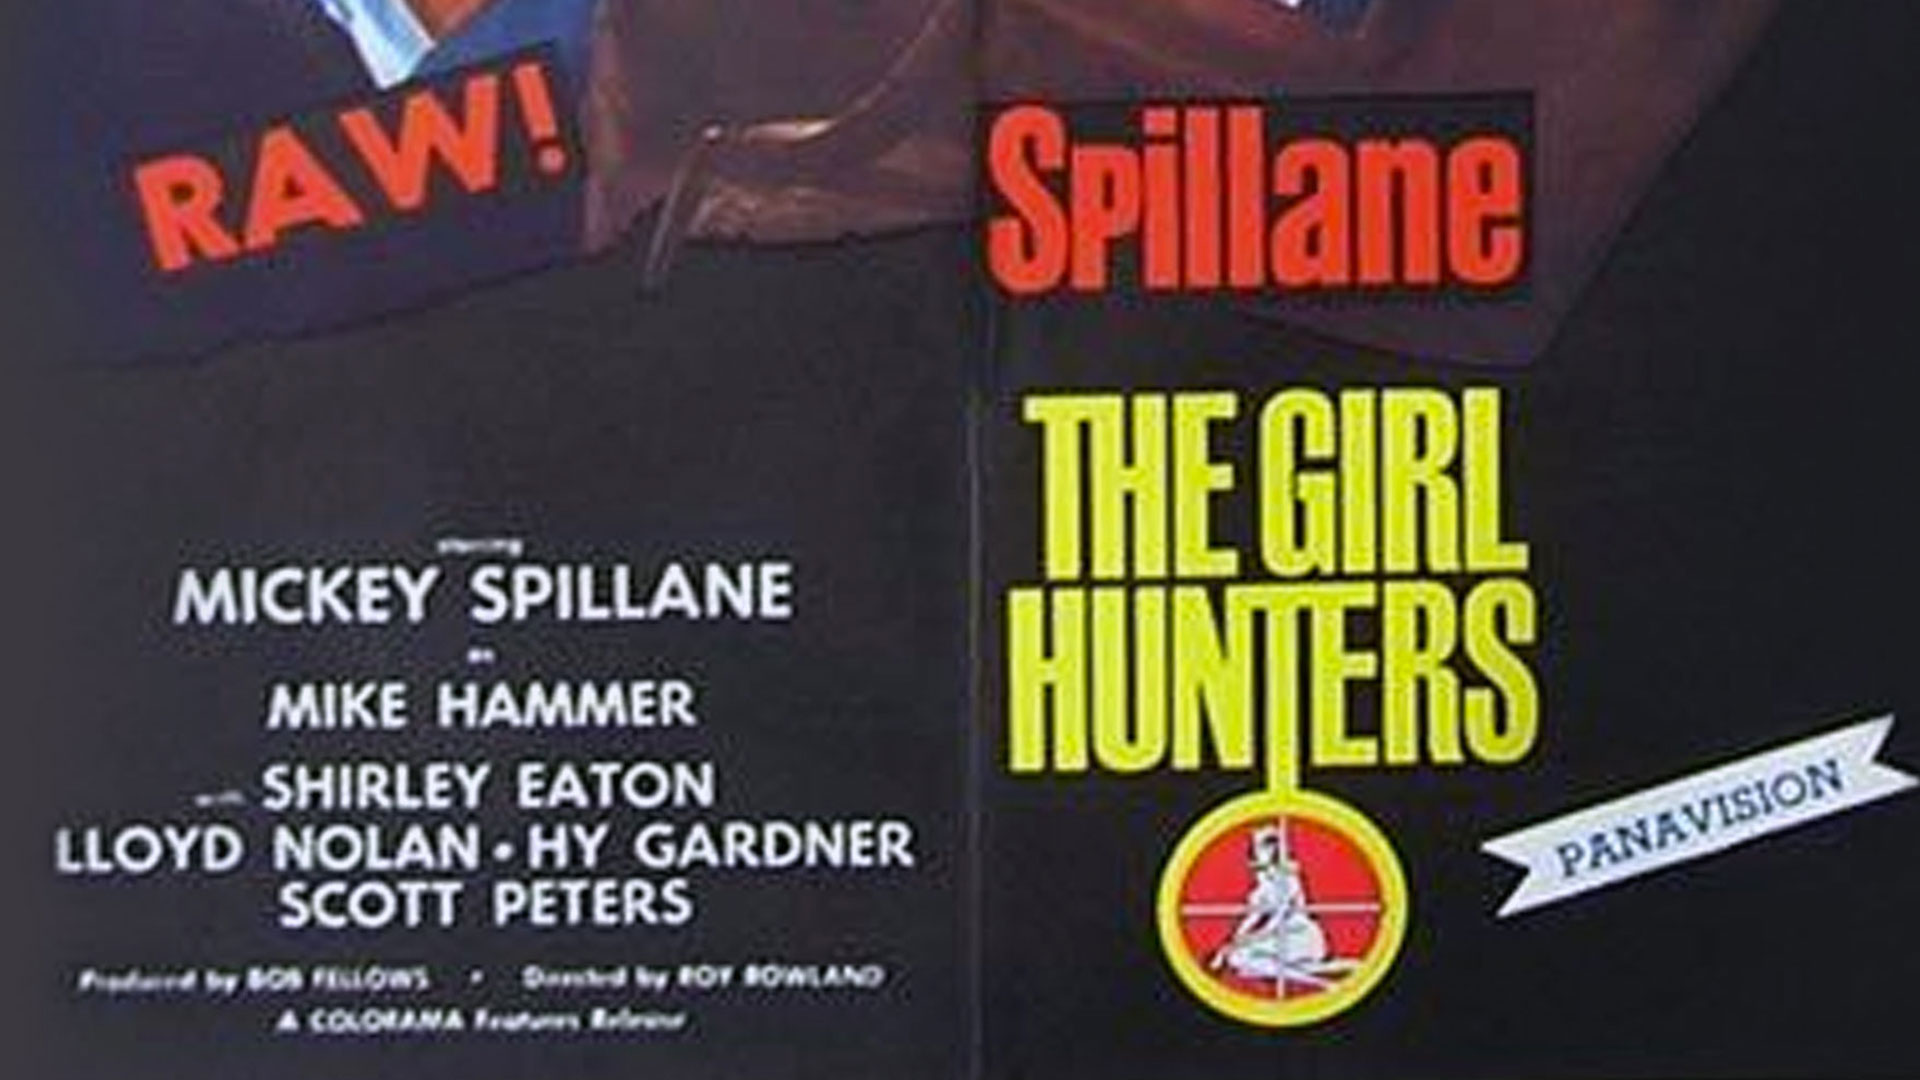 The Girl Hunters